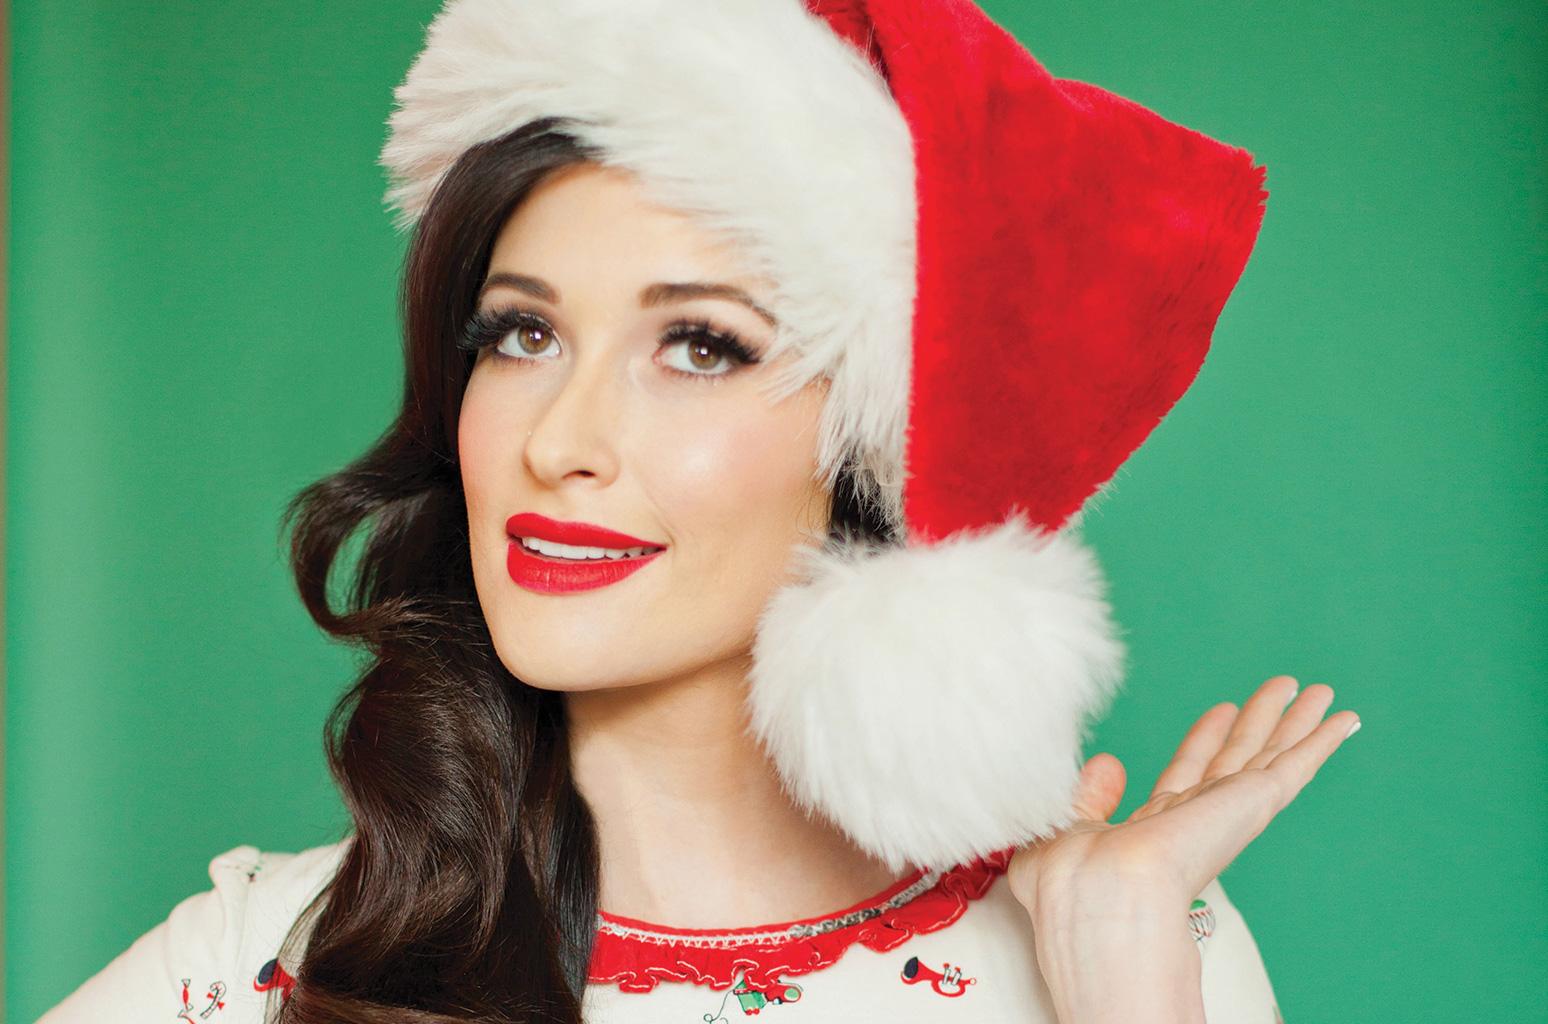 De 25 van 2016: 25. Kacey Musgraves – A Very Kacey Christmas